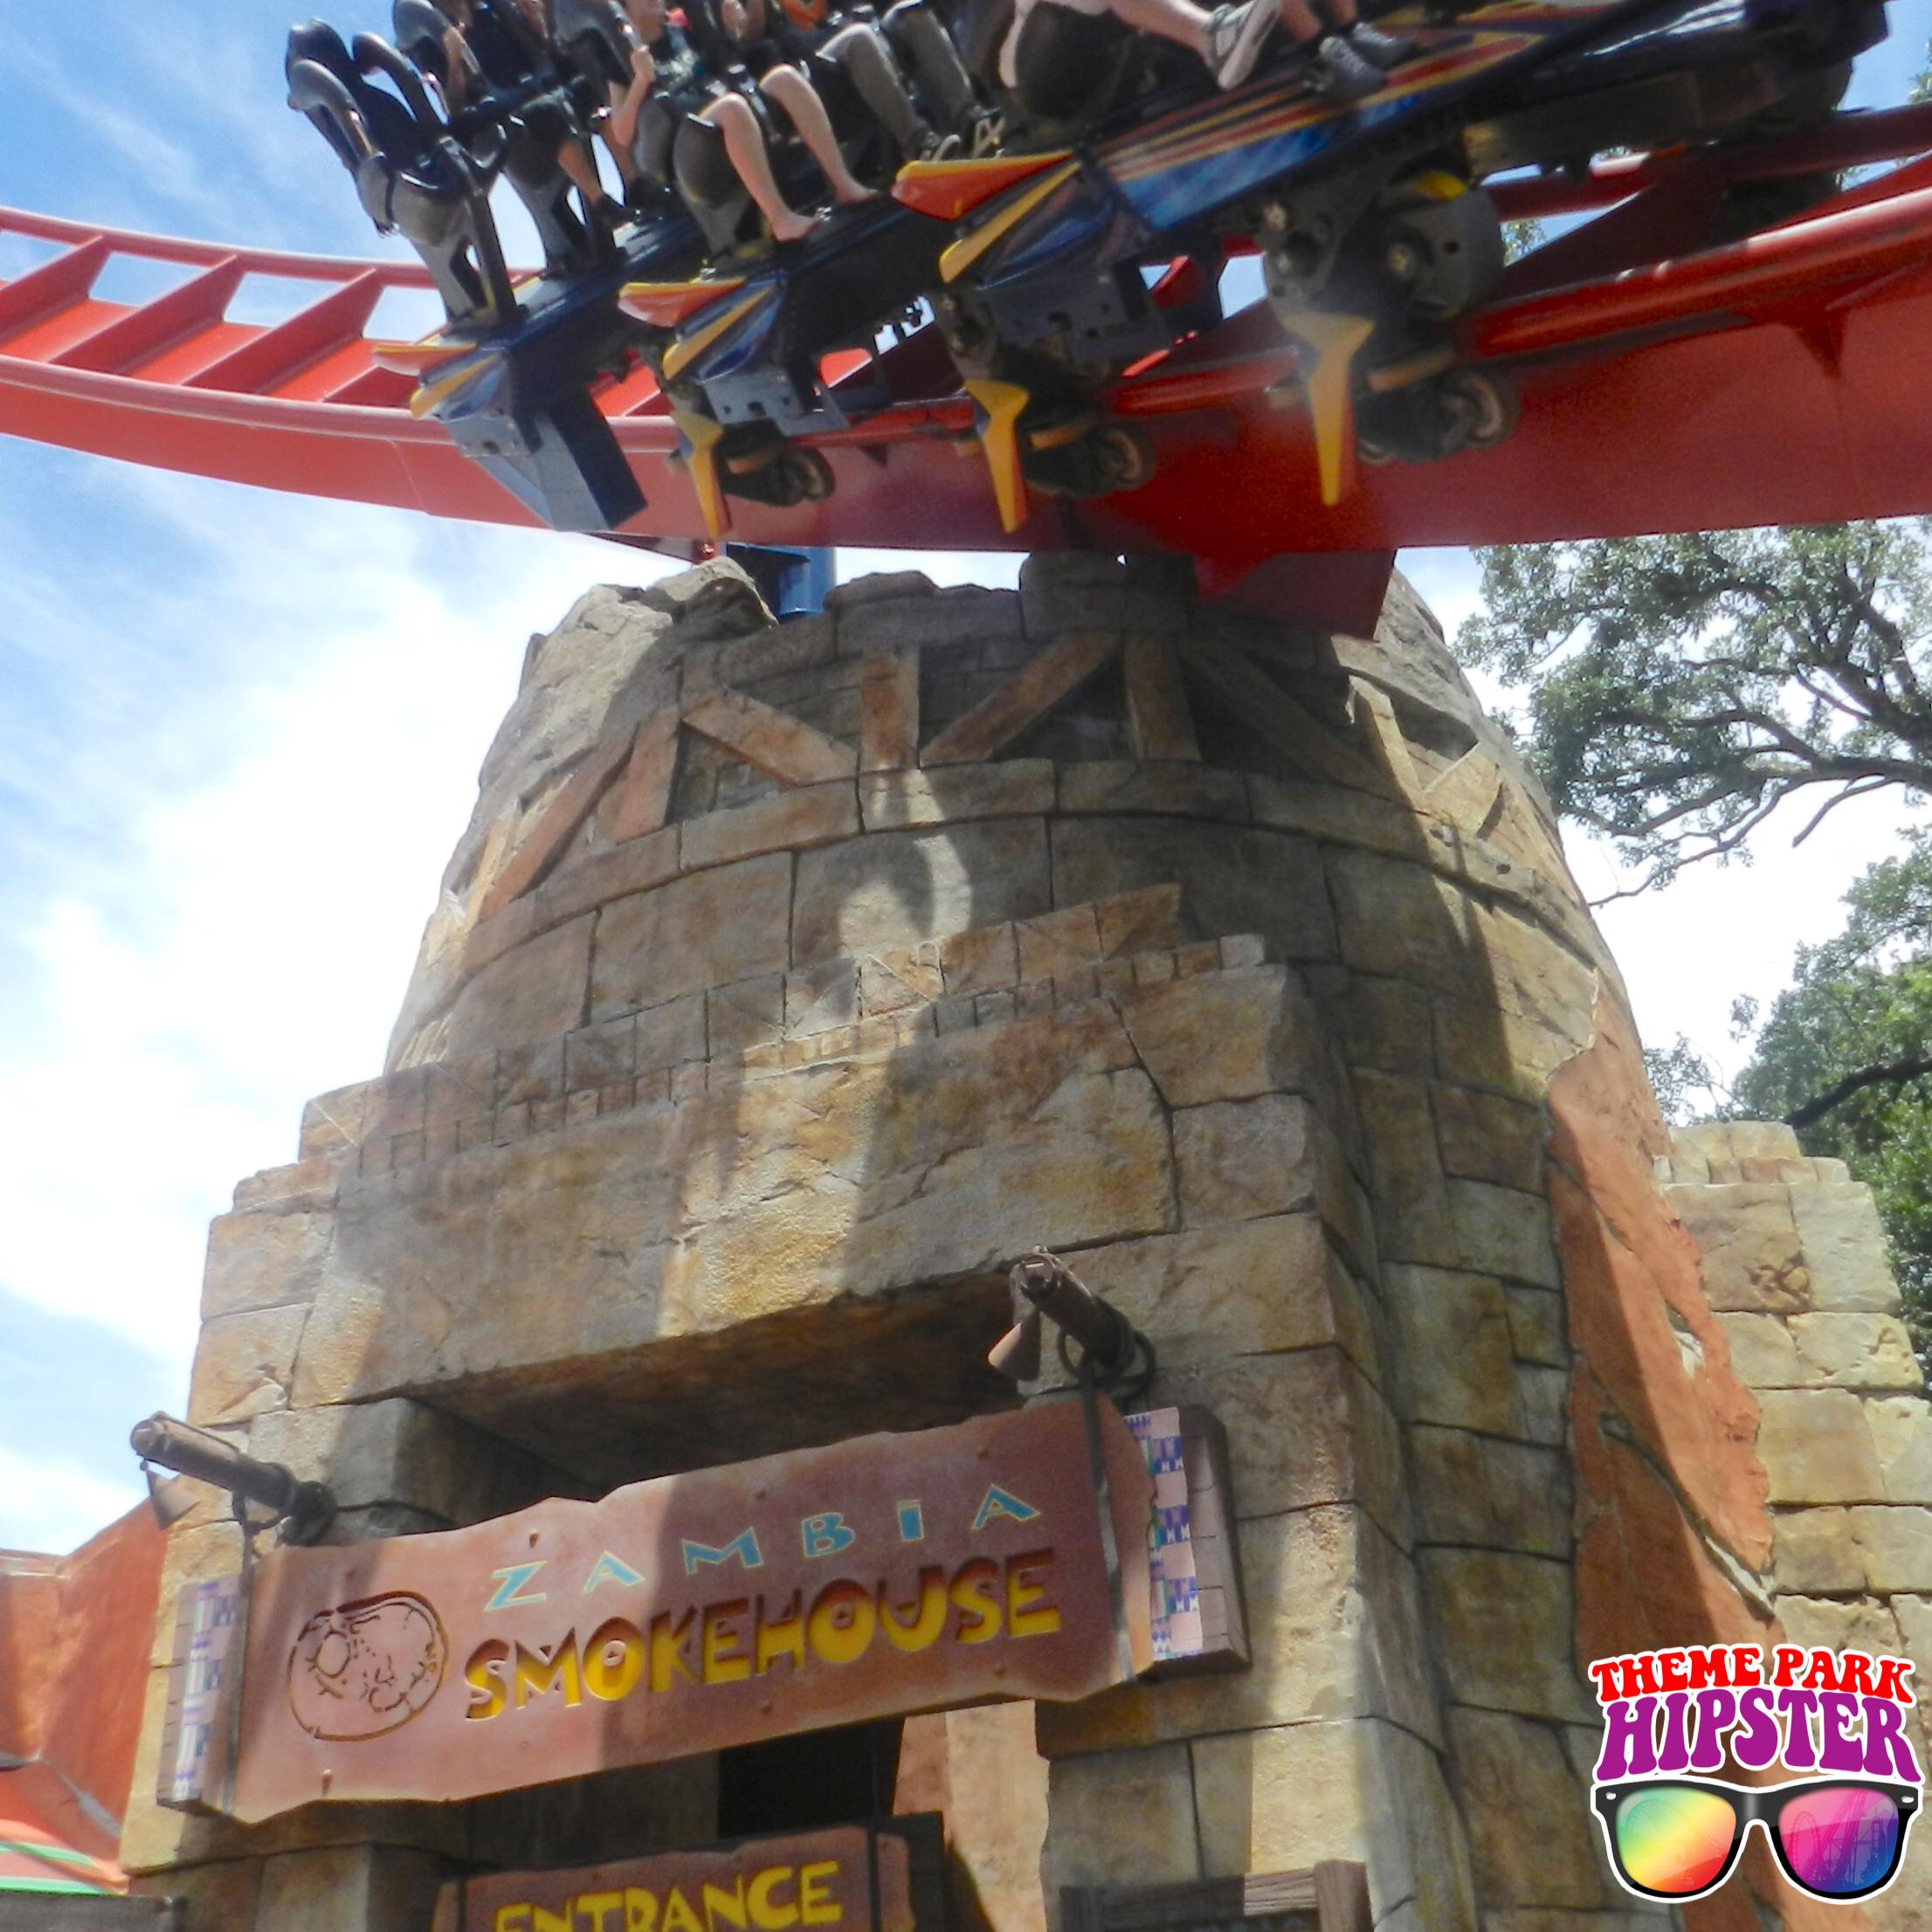 Zambia Smokehouse Busch Gardens with large Sheikra roller coaster.